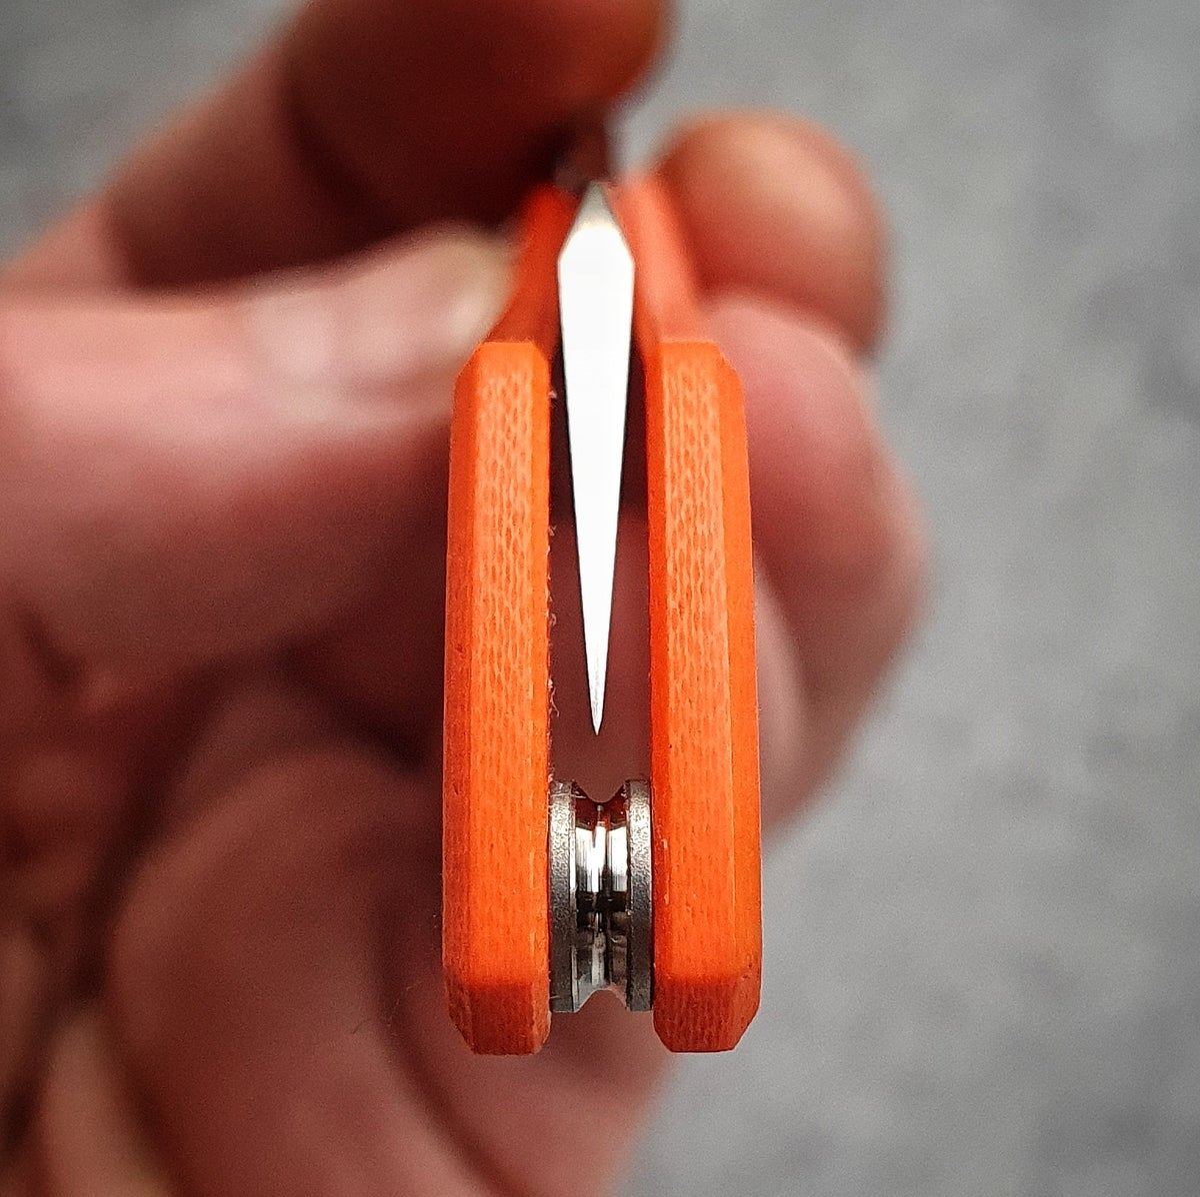 Image of Karbo G10 orange